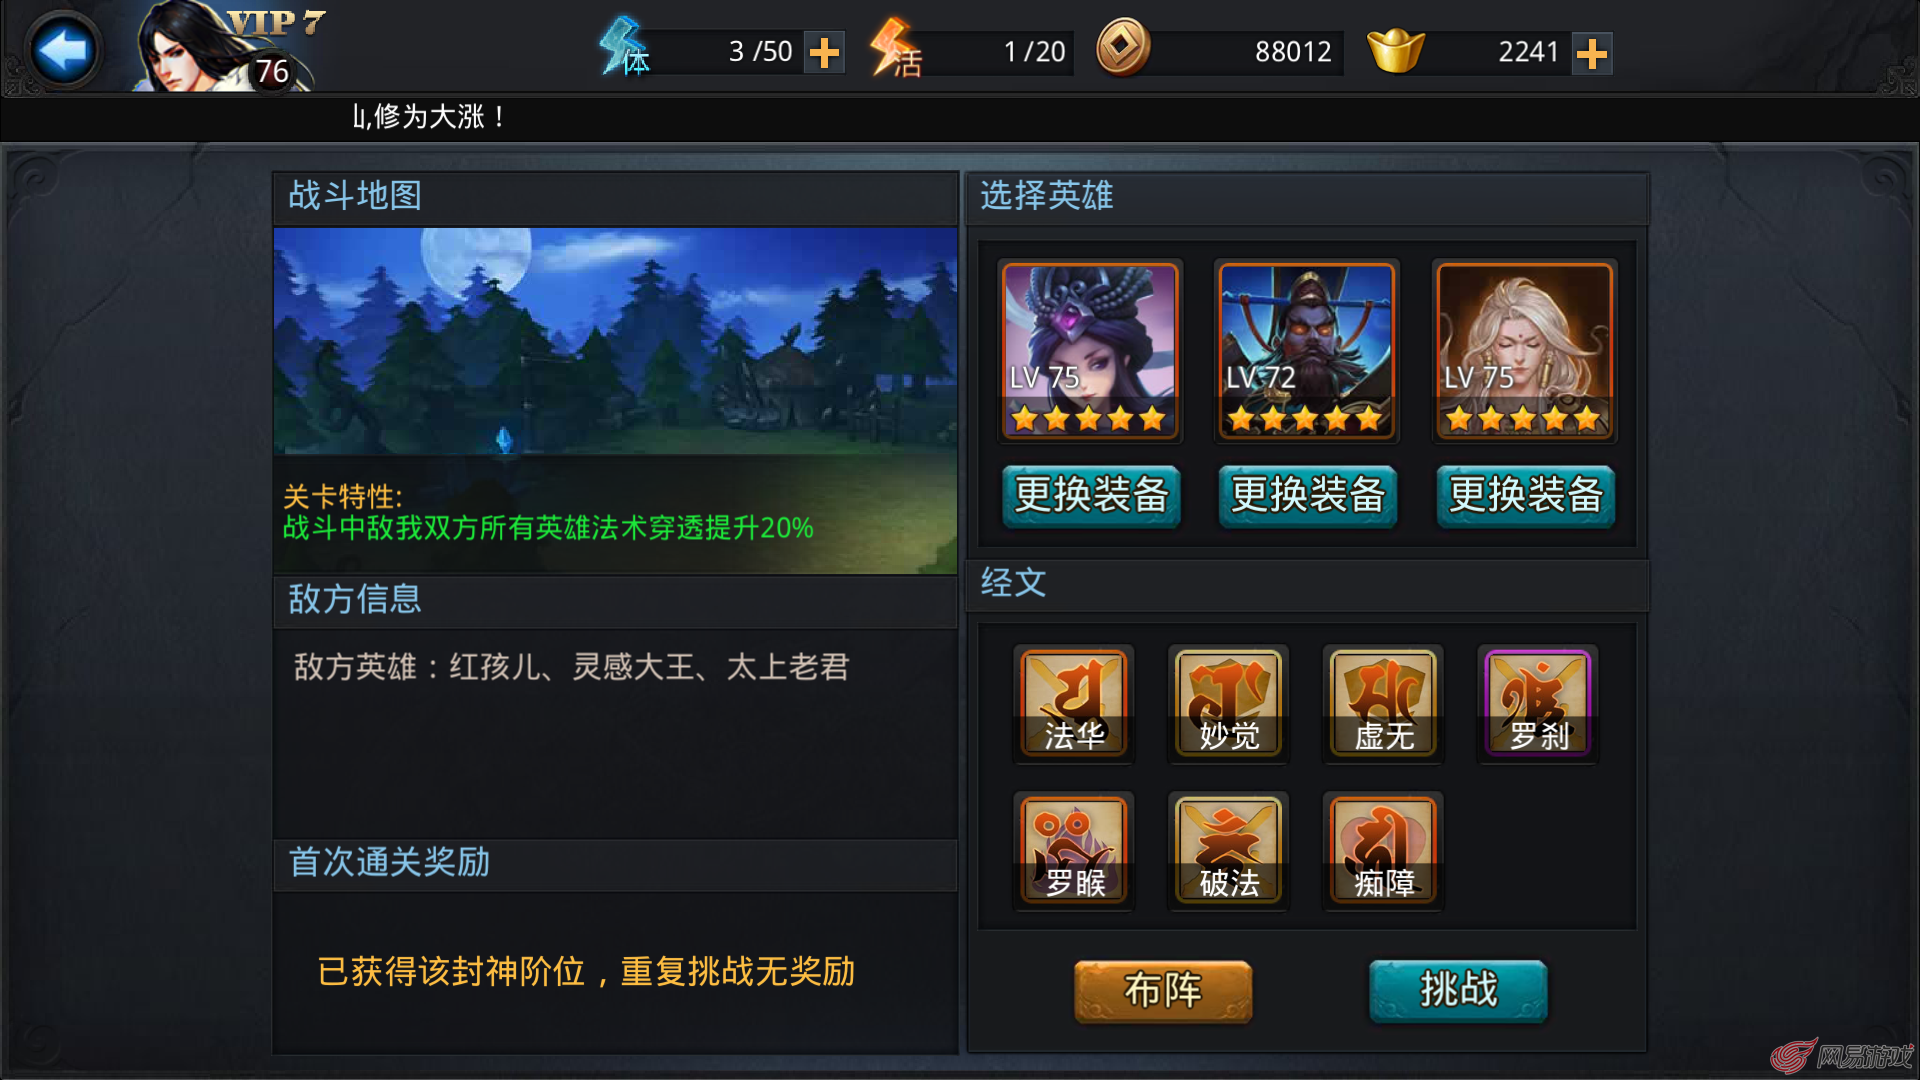 Screenshot_2015-01-30-16-37-23_乱斗西游.png